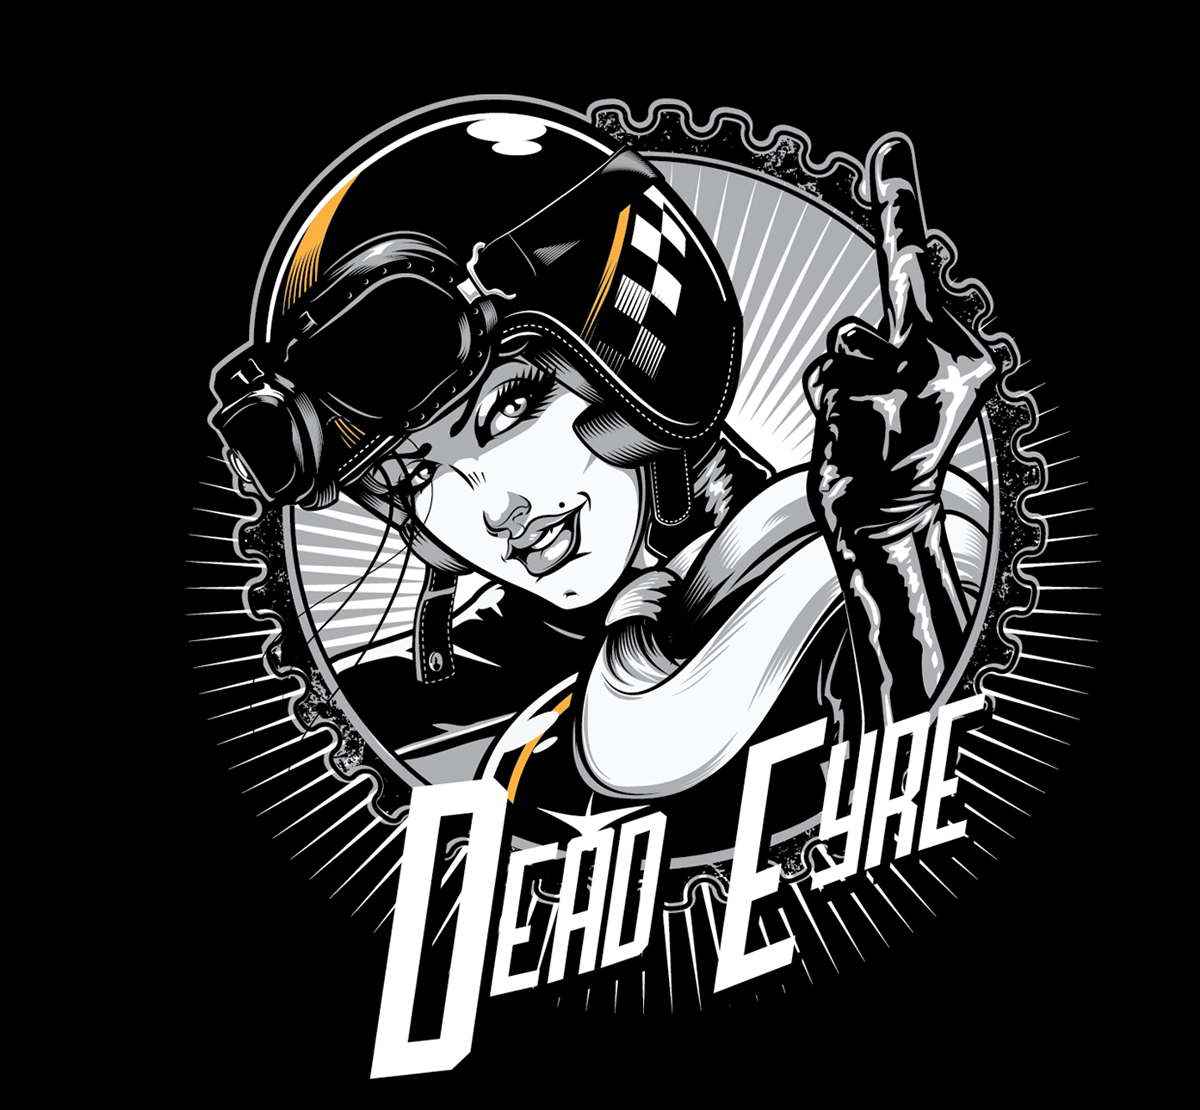 Dead Eyre Clothing T-Shirt Design